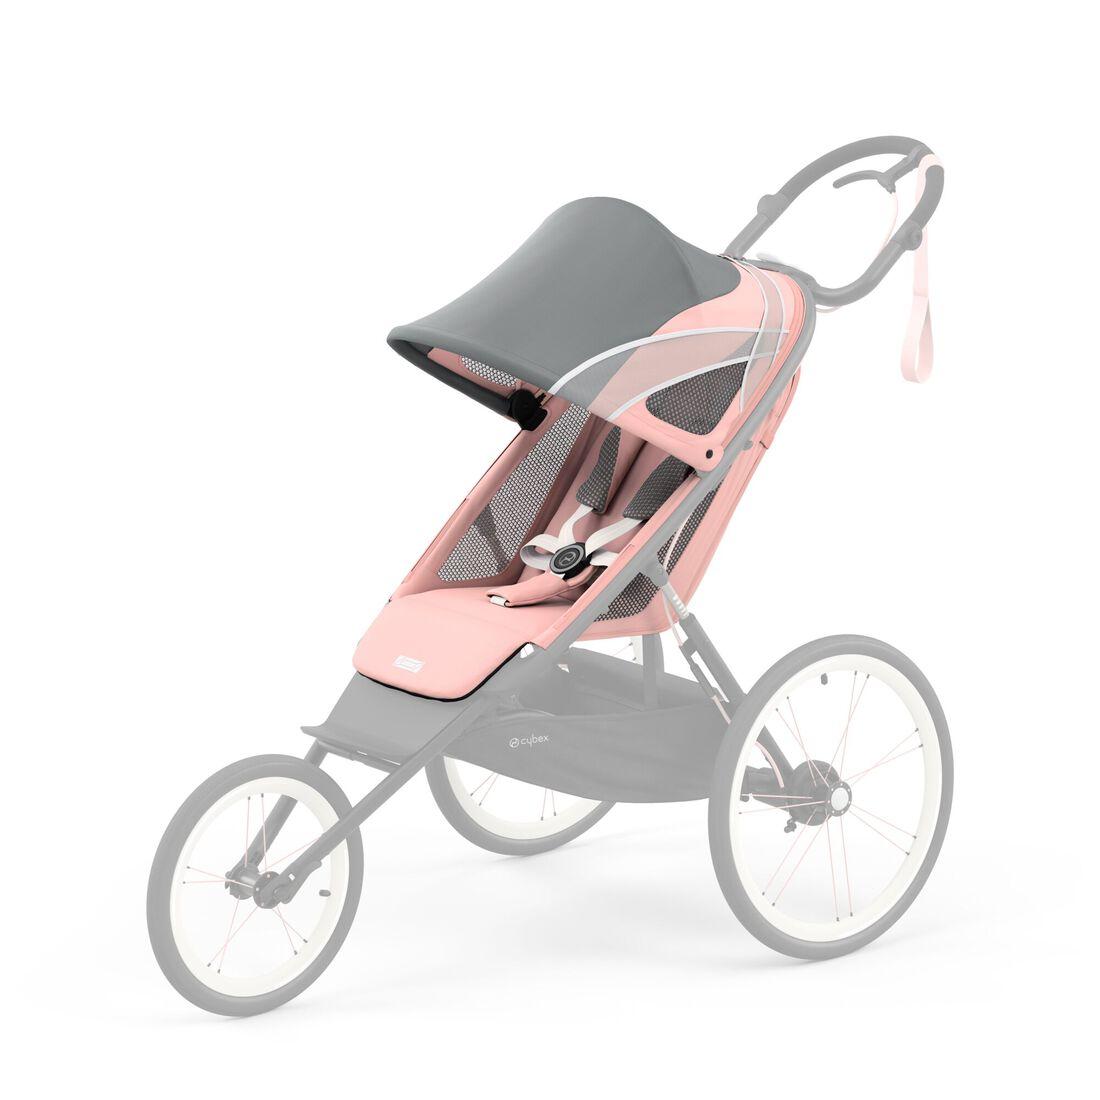 CYBEX Avi Sitzpaket - Silver Pink in Silver Pink large Bild 1